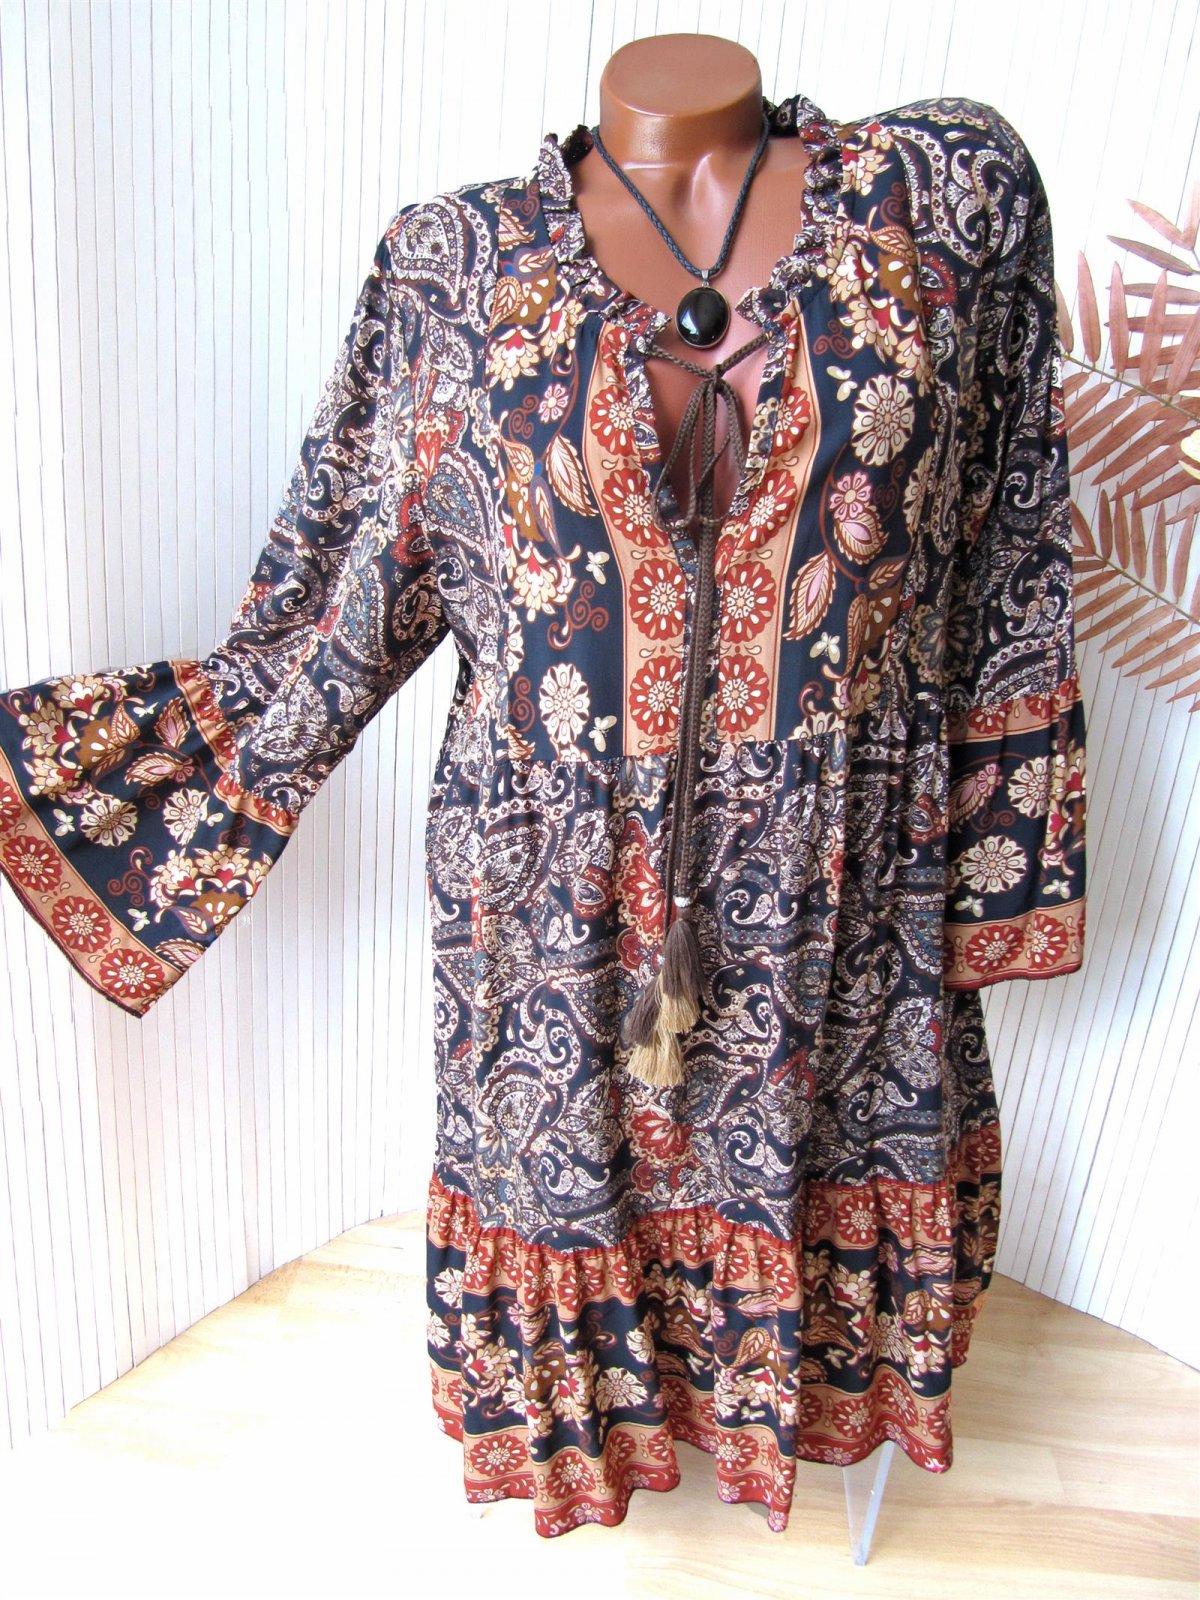 Ibiza Boho Hippie Kleid Hängerchen Tunika Paisley 9 9 9 9 br